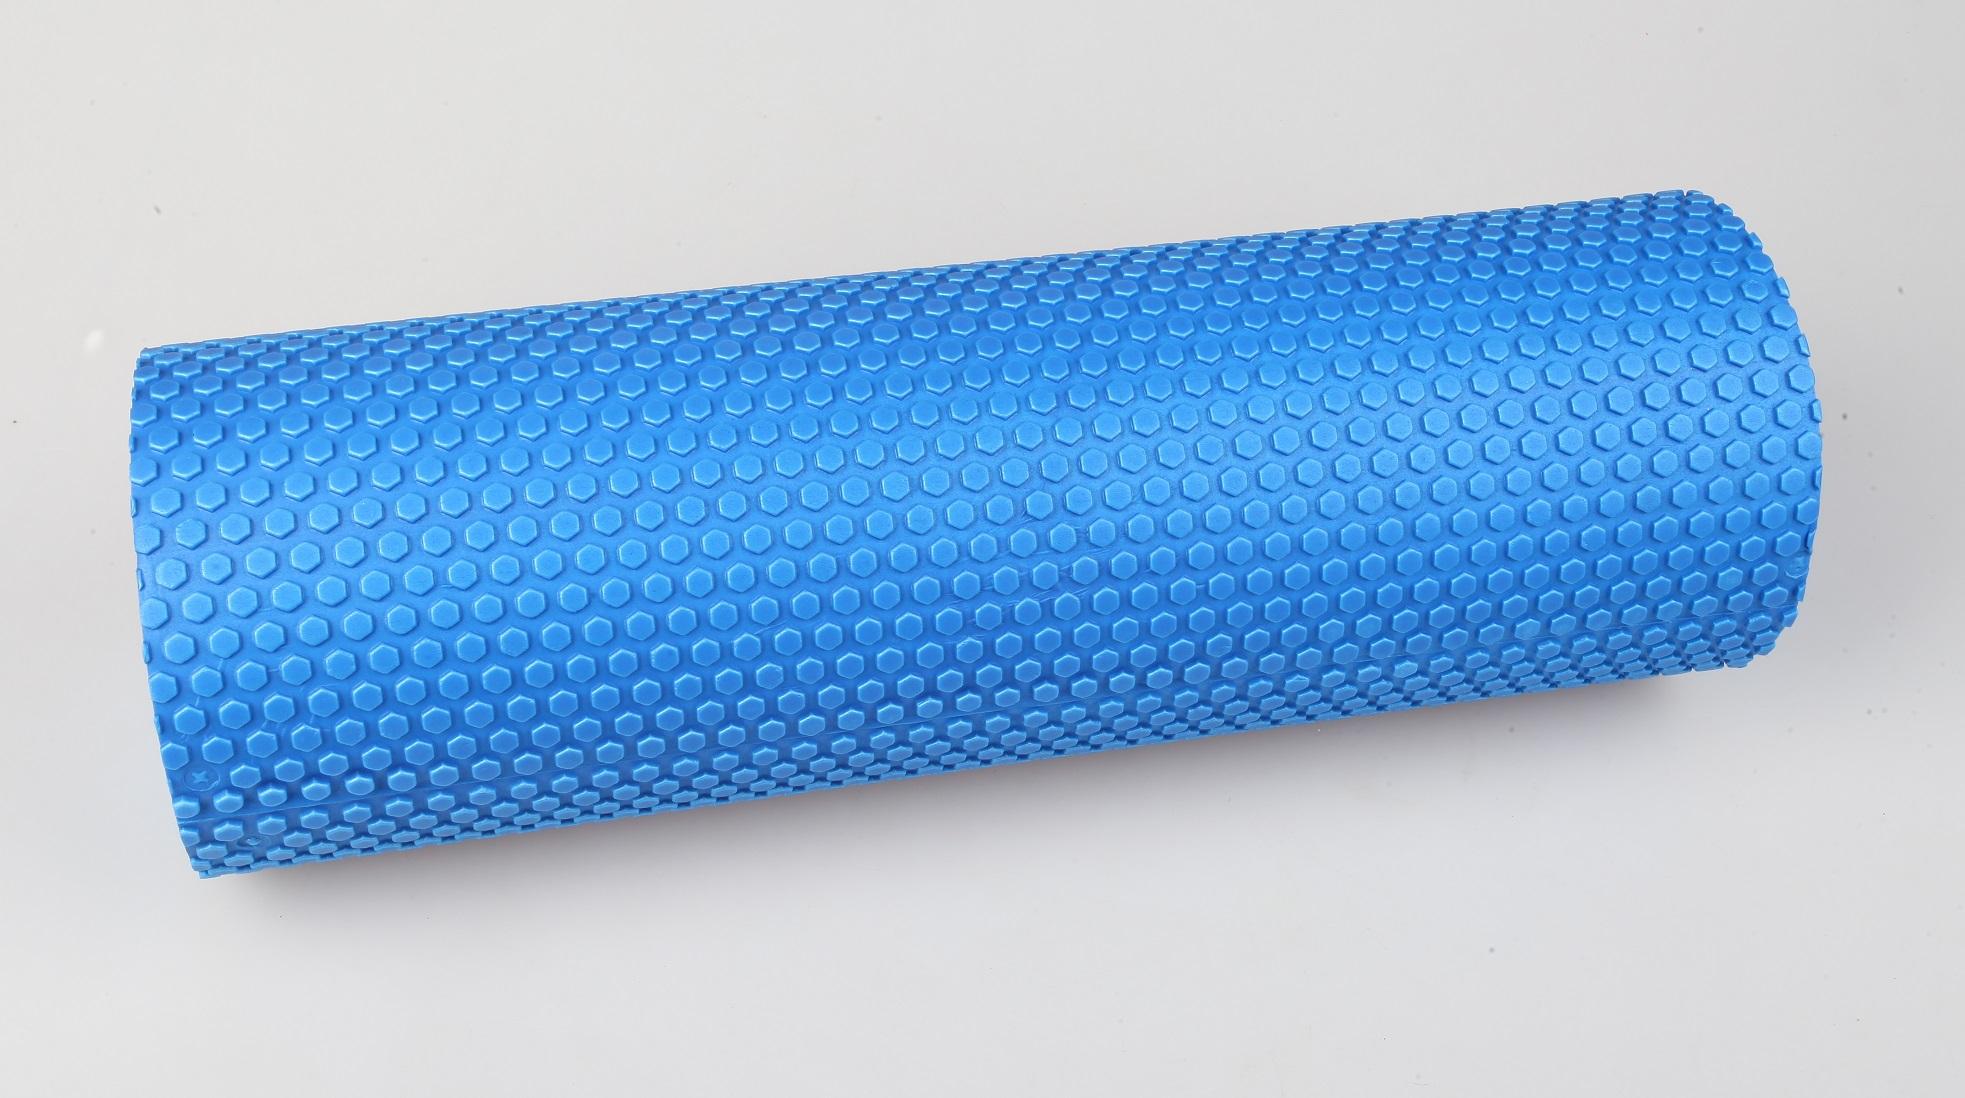 Foam Roller - Yoga/Pilates  Z2569